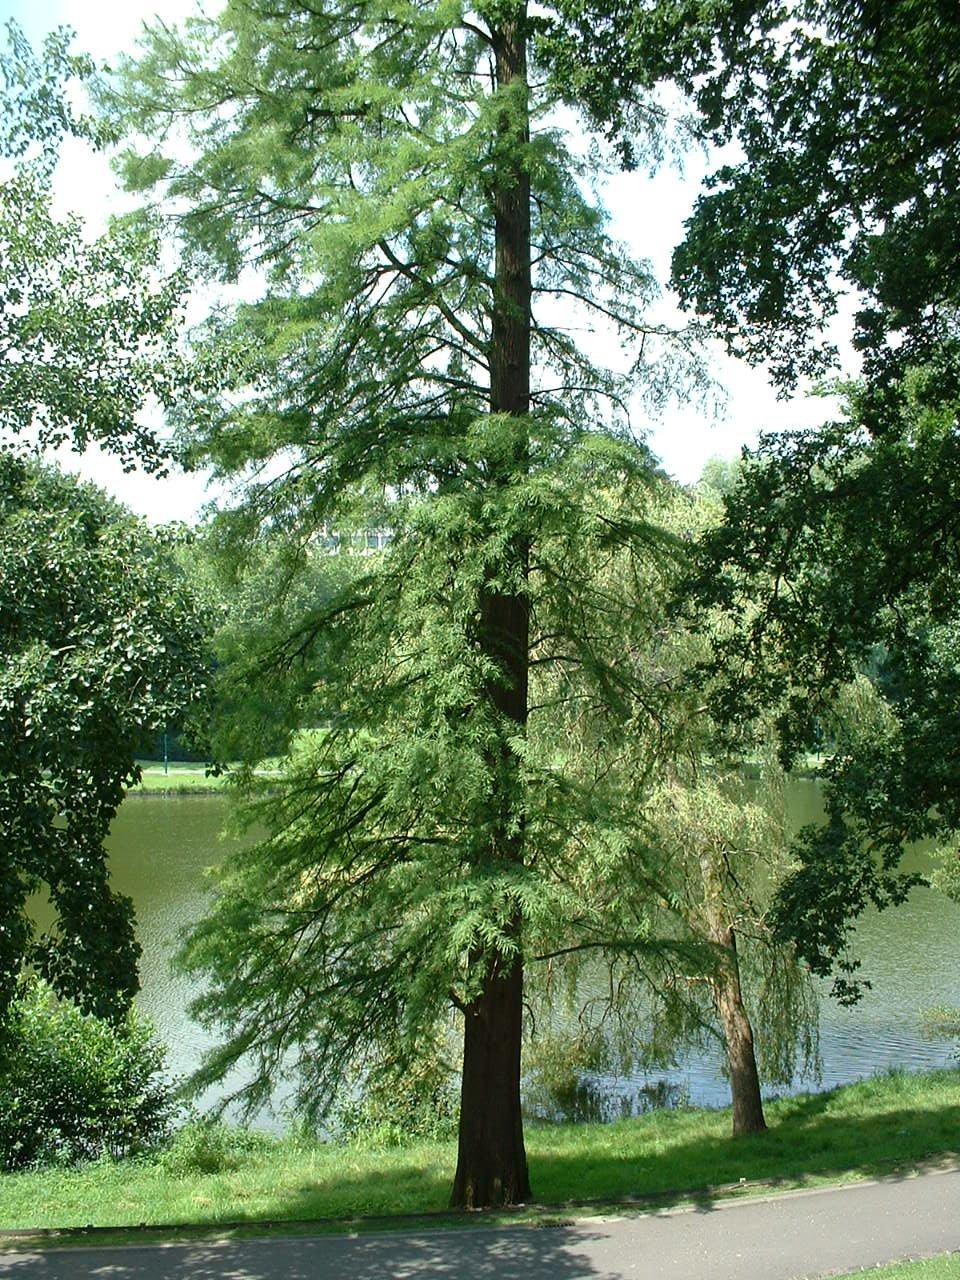 Cyprès chauve de Louisiane – Watermael-Boitsfort, Parc Tenreuken, Avenue du Grand Forestier –  19 Juillet 2002